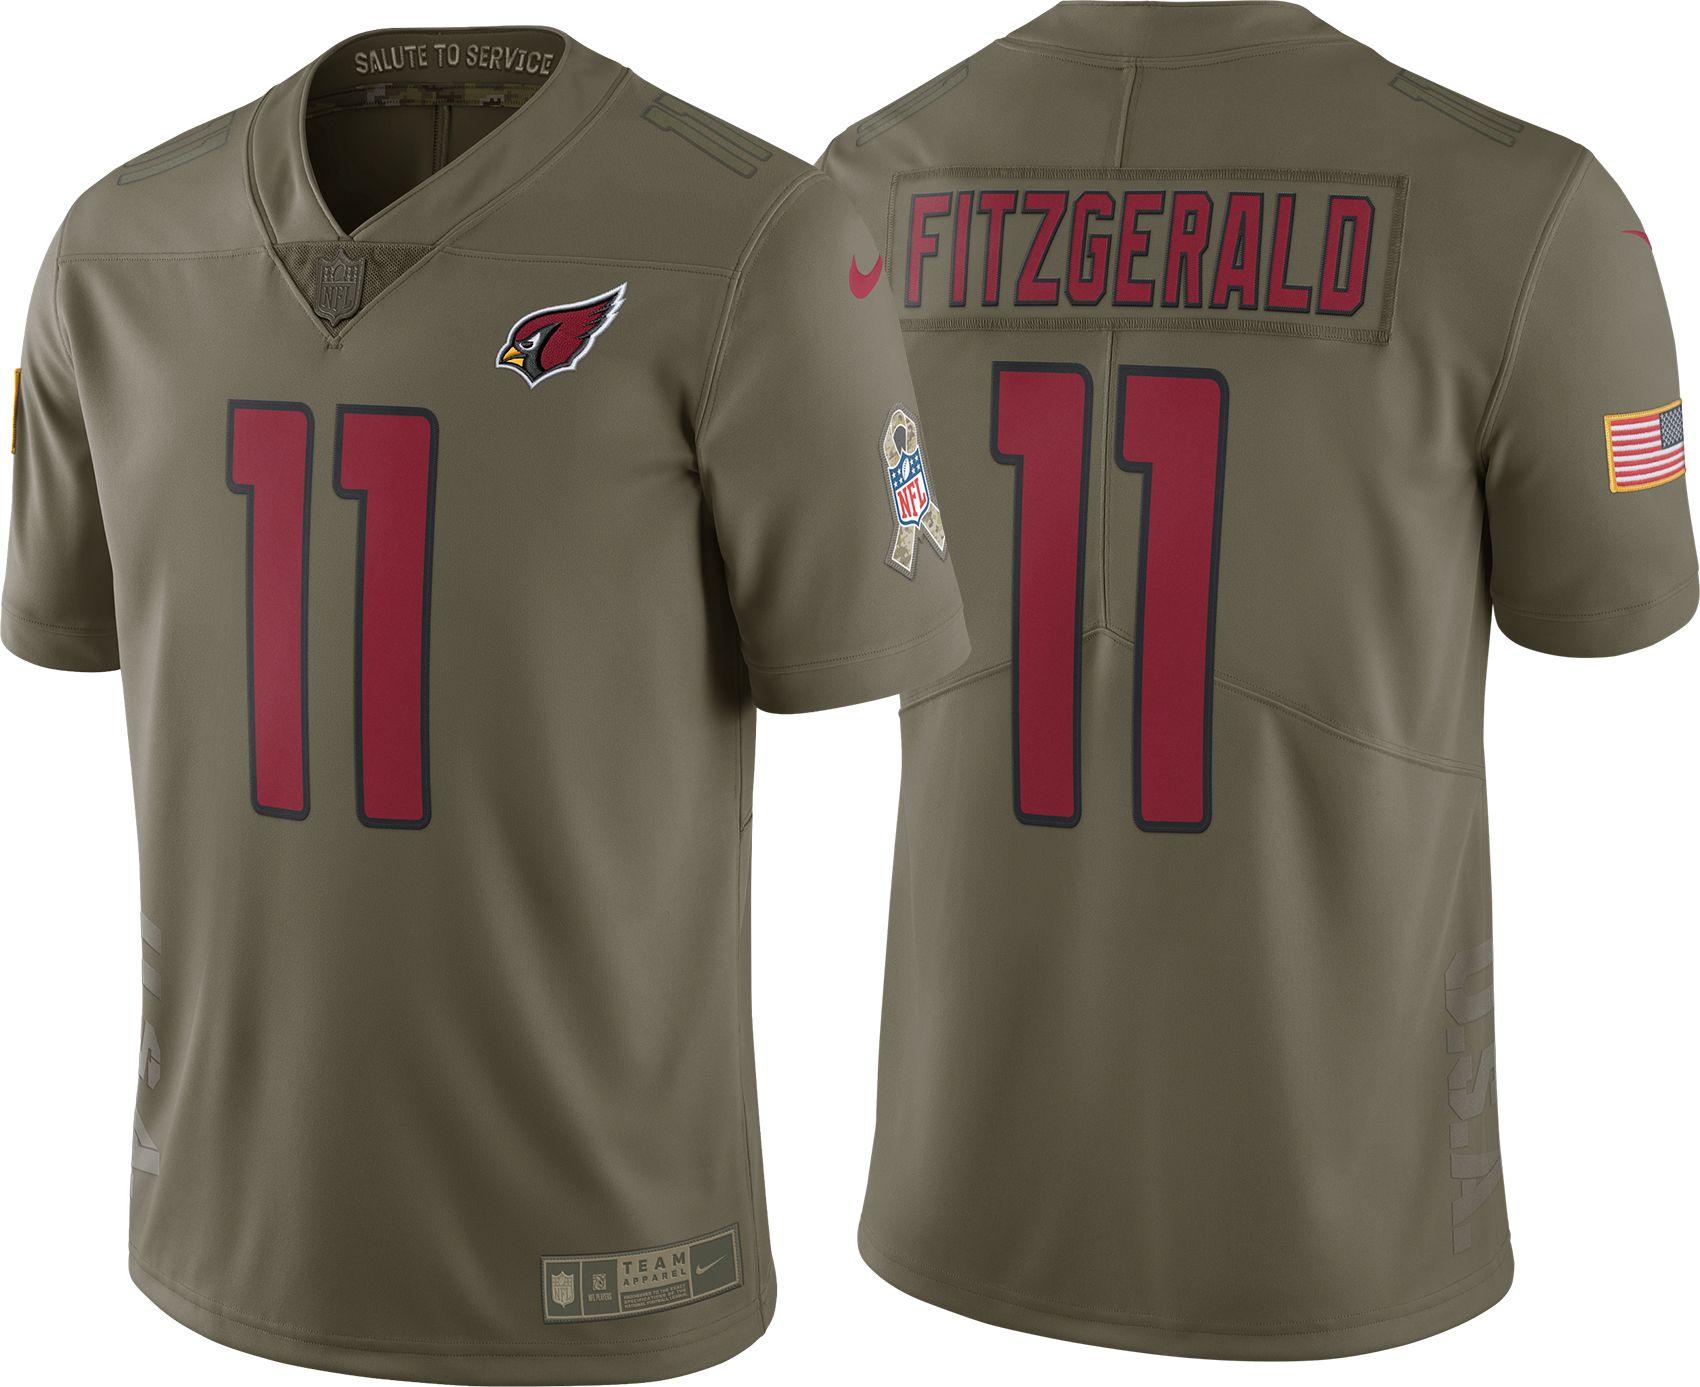 superior quality 03d5f 49b68 arizona cardinals salute to service shirt